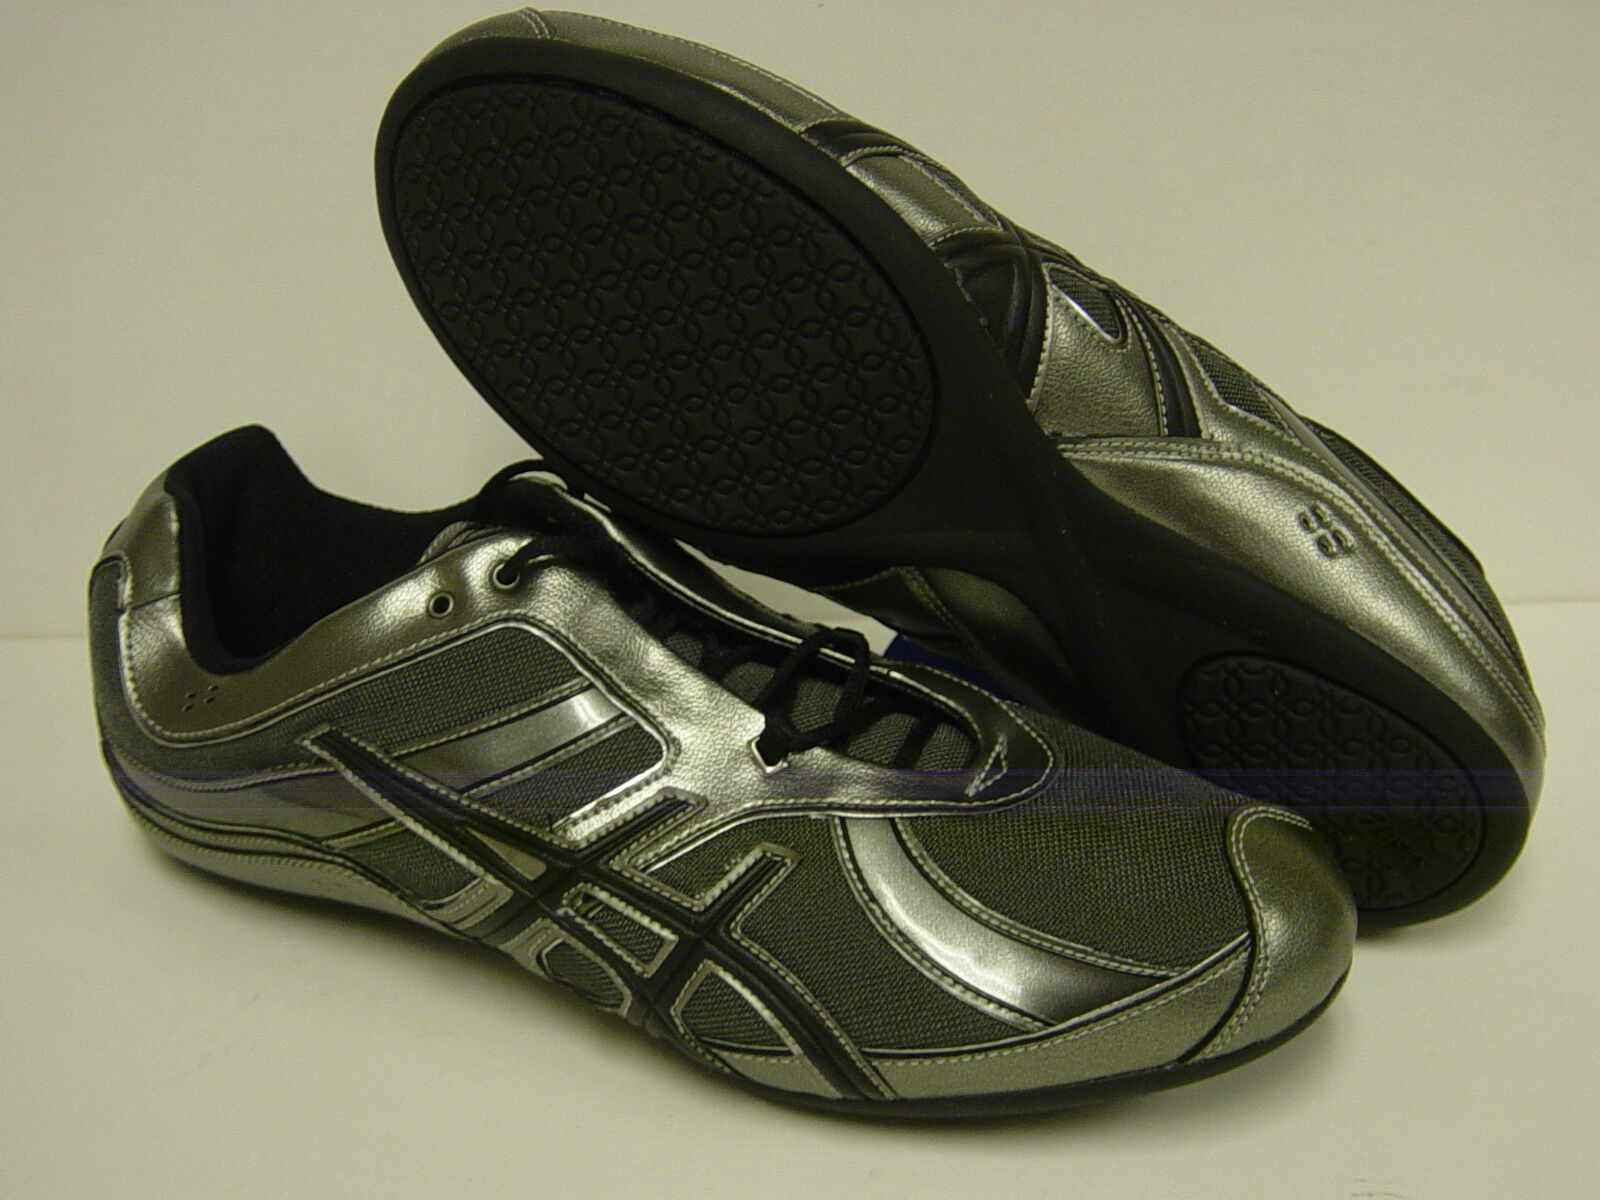 NEW Womens Sz 12 ASICS Gel Rhythmic S175N 8090 Dance Gunmetal Sneakers Shoes Casual wild